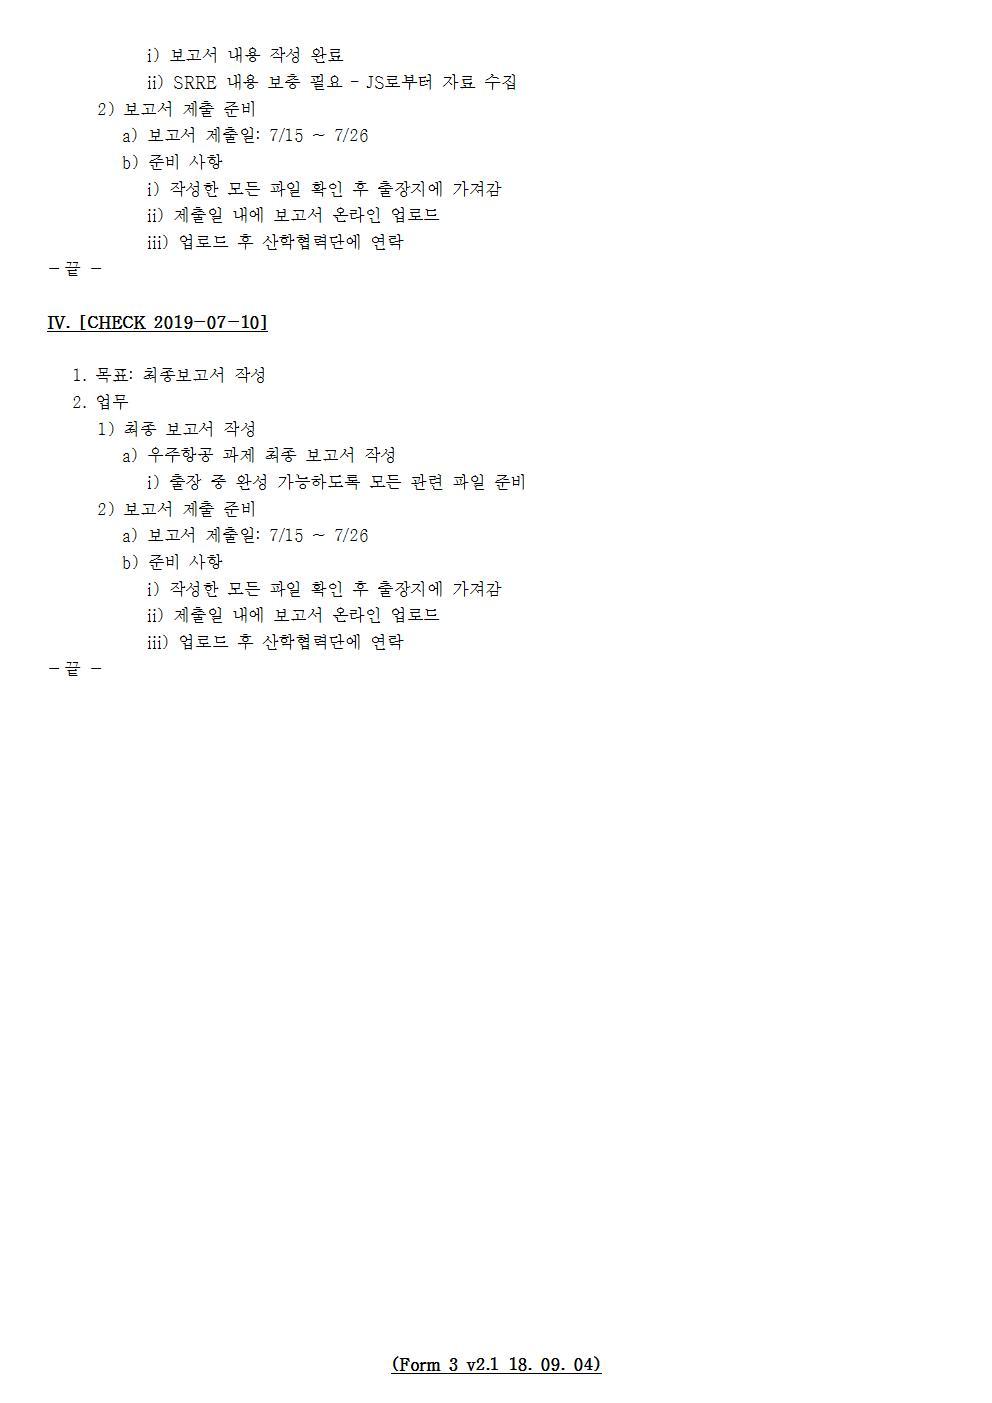 D-[19-005-RD-05]-[final report]-[2019-07-10][YB]-[19-7-2]-[P+D+C]002.jpg